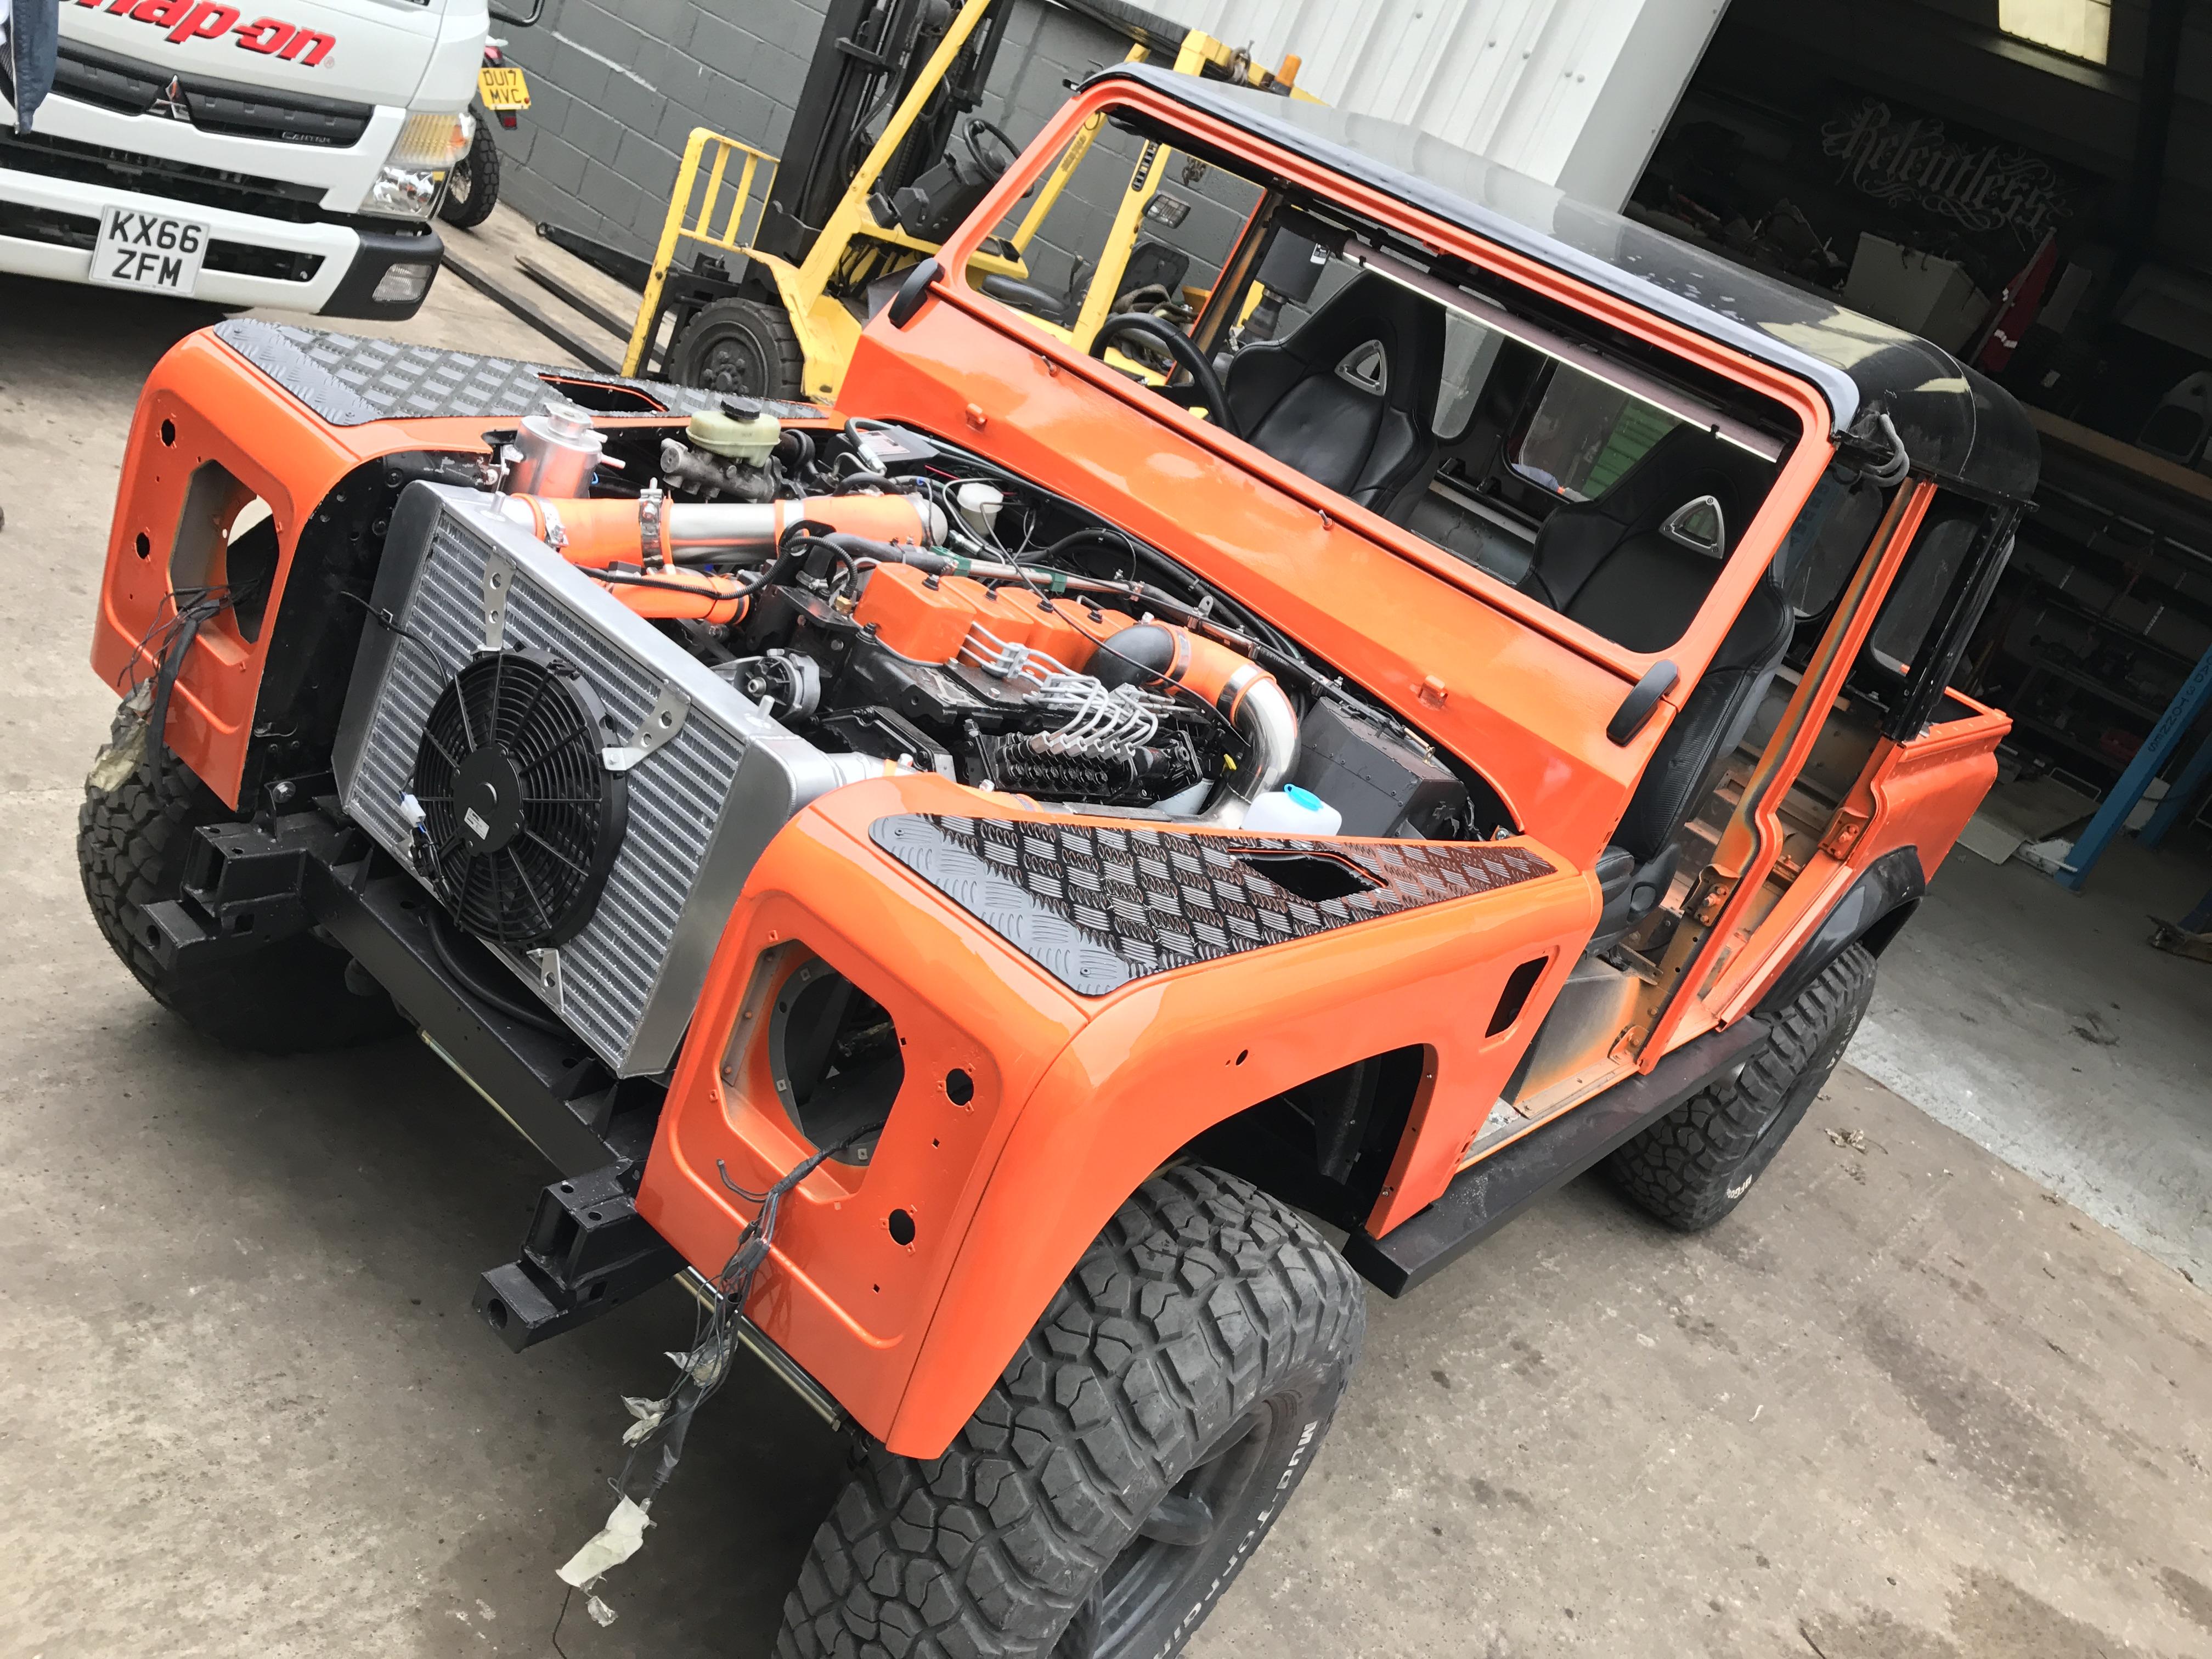 4x4 Fabrication | Cummins Engine Conversions | Shropshire UK